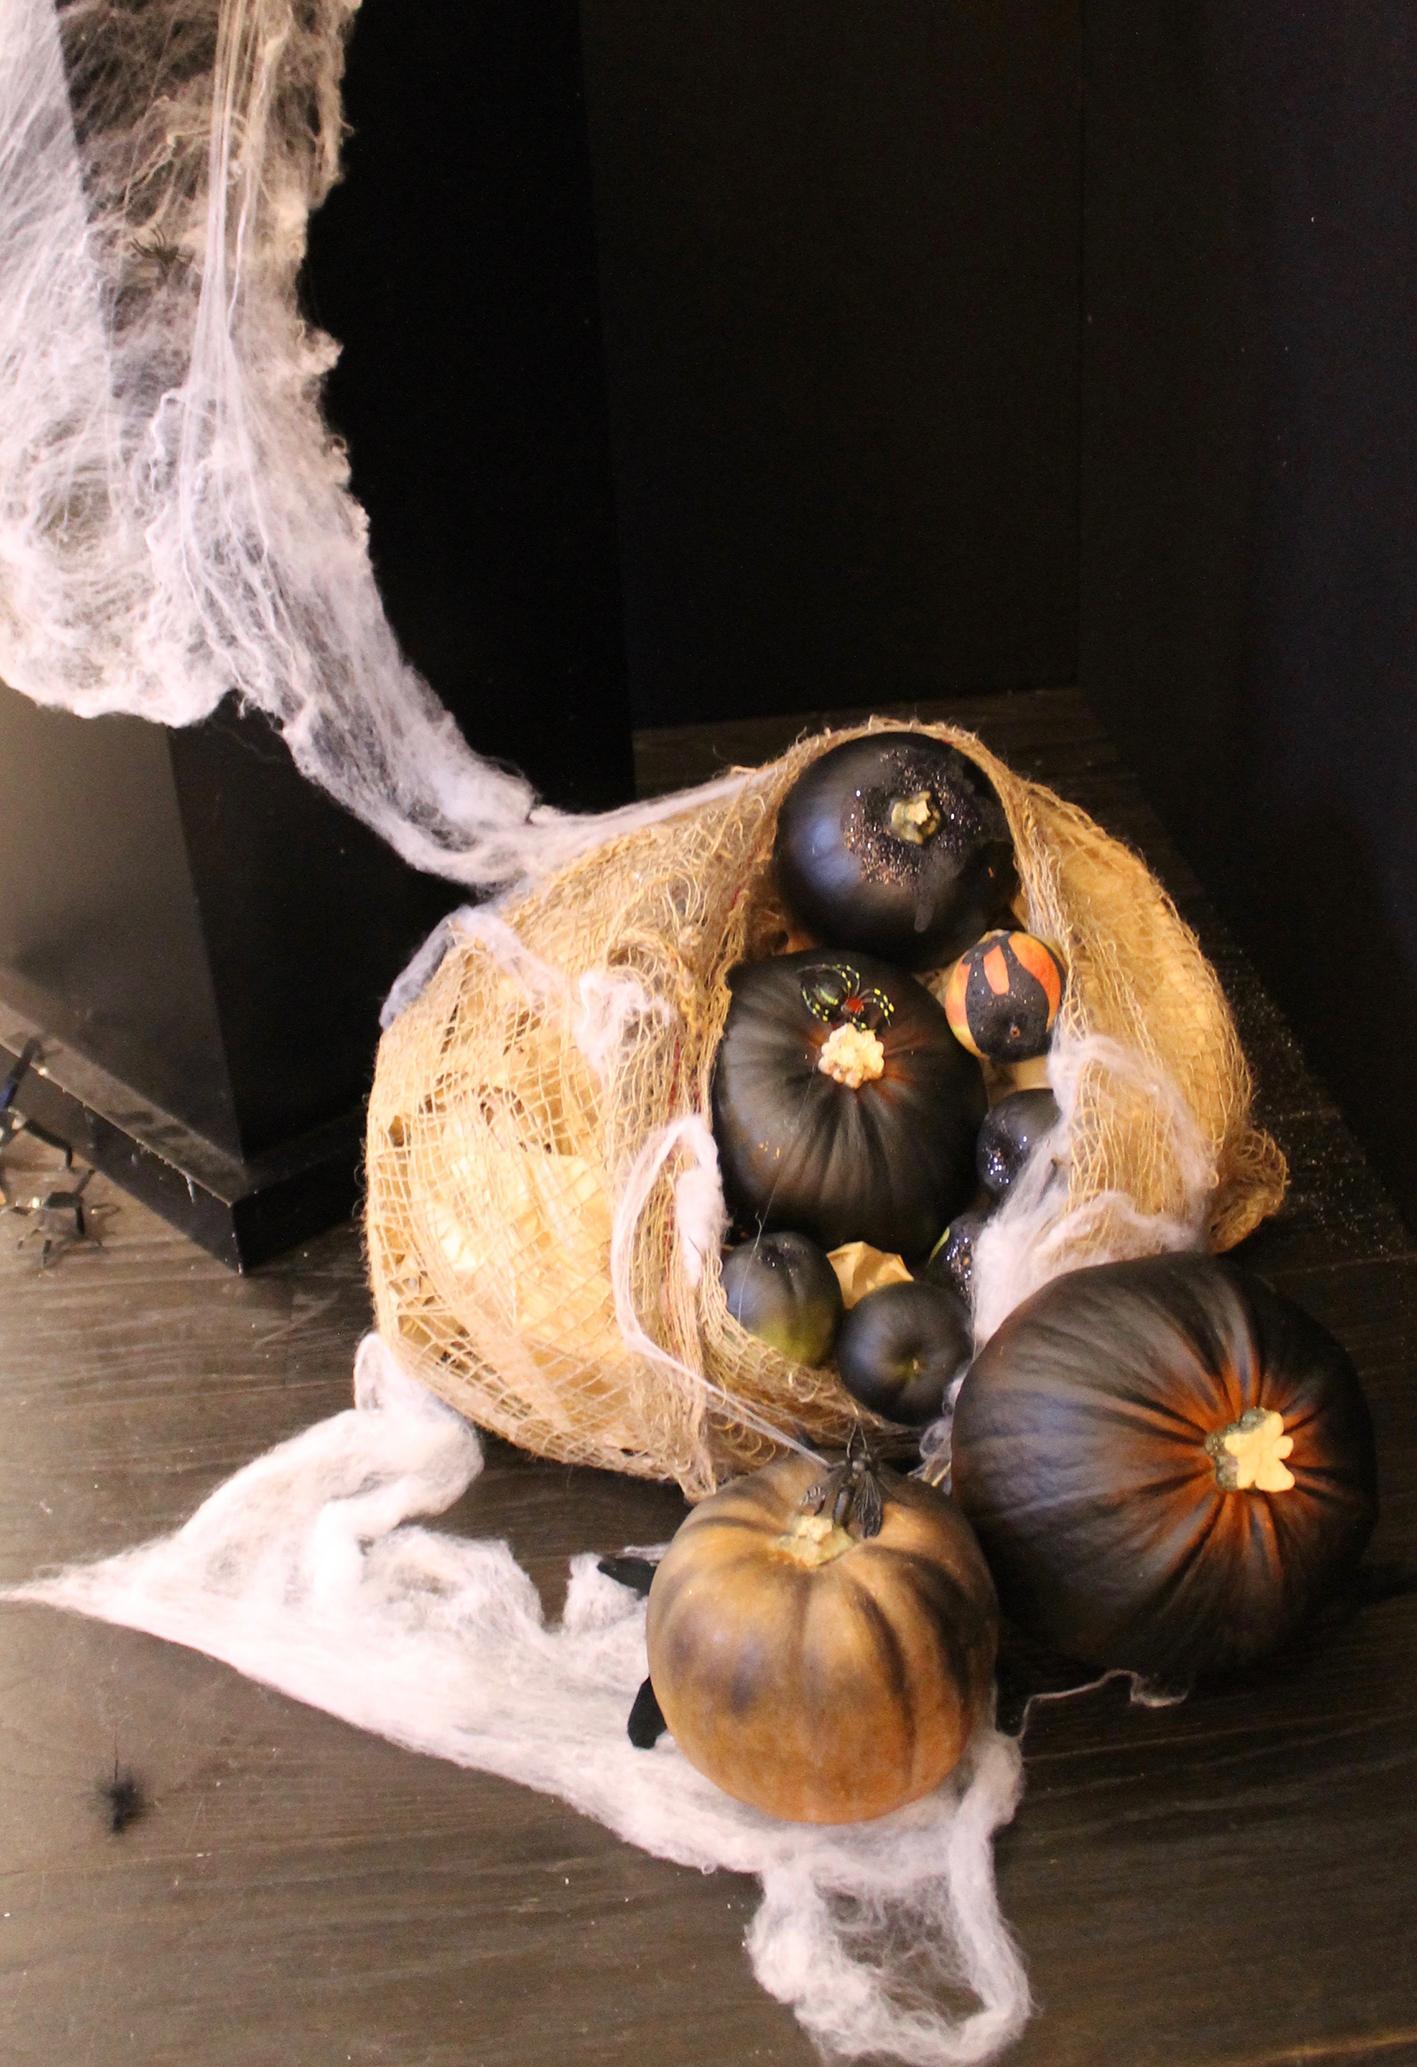 Superdrug Halloween 2016 Pumpkins in Sack Joanna Thornhill